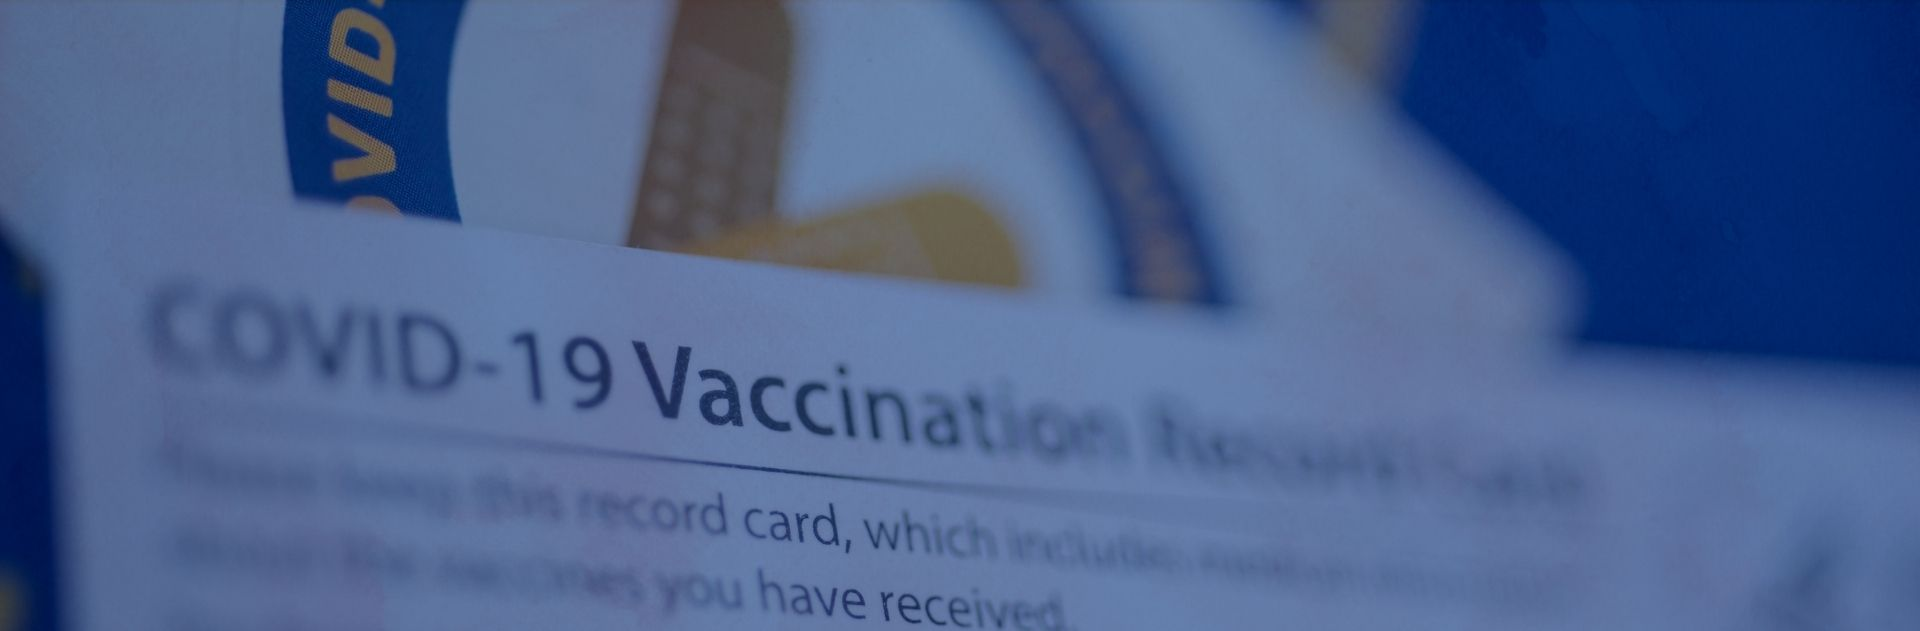 Vaccine-Disclosure_Slide